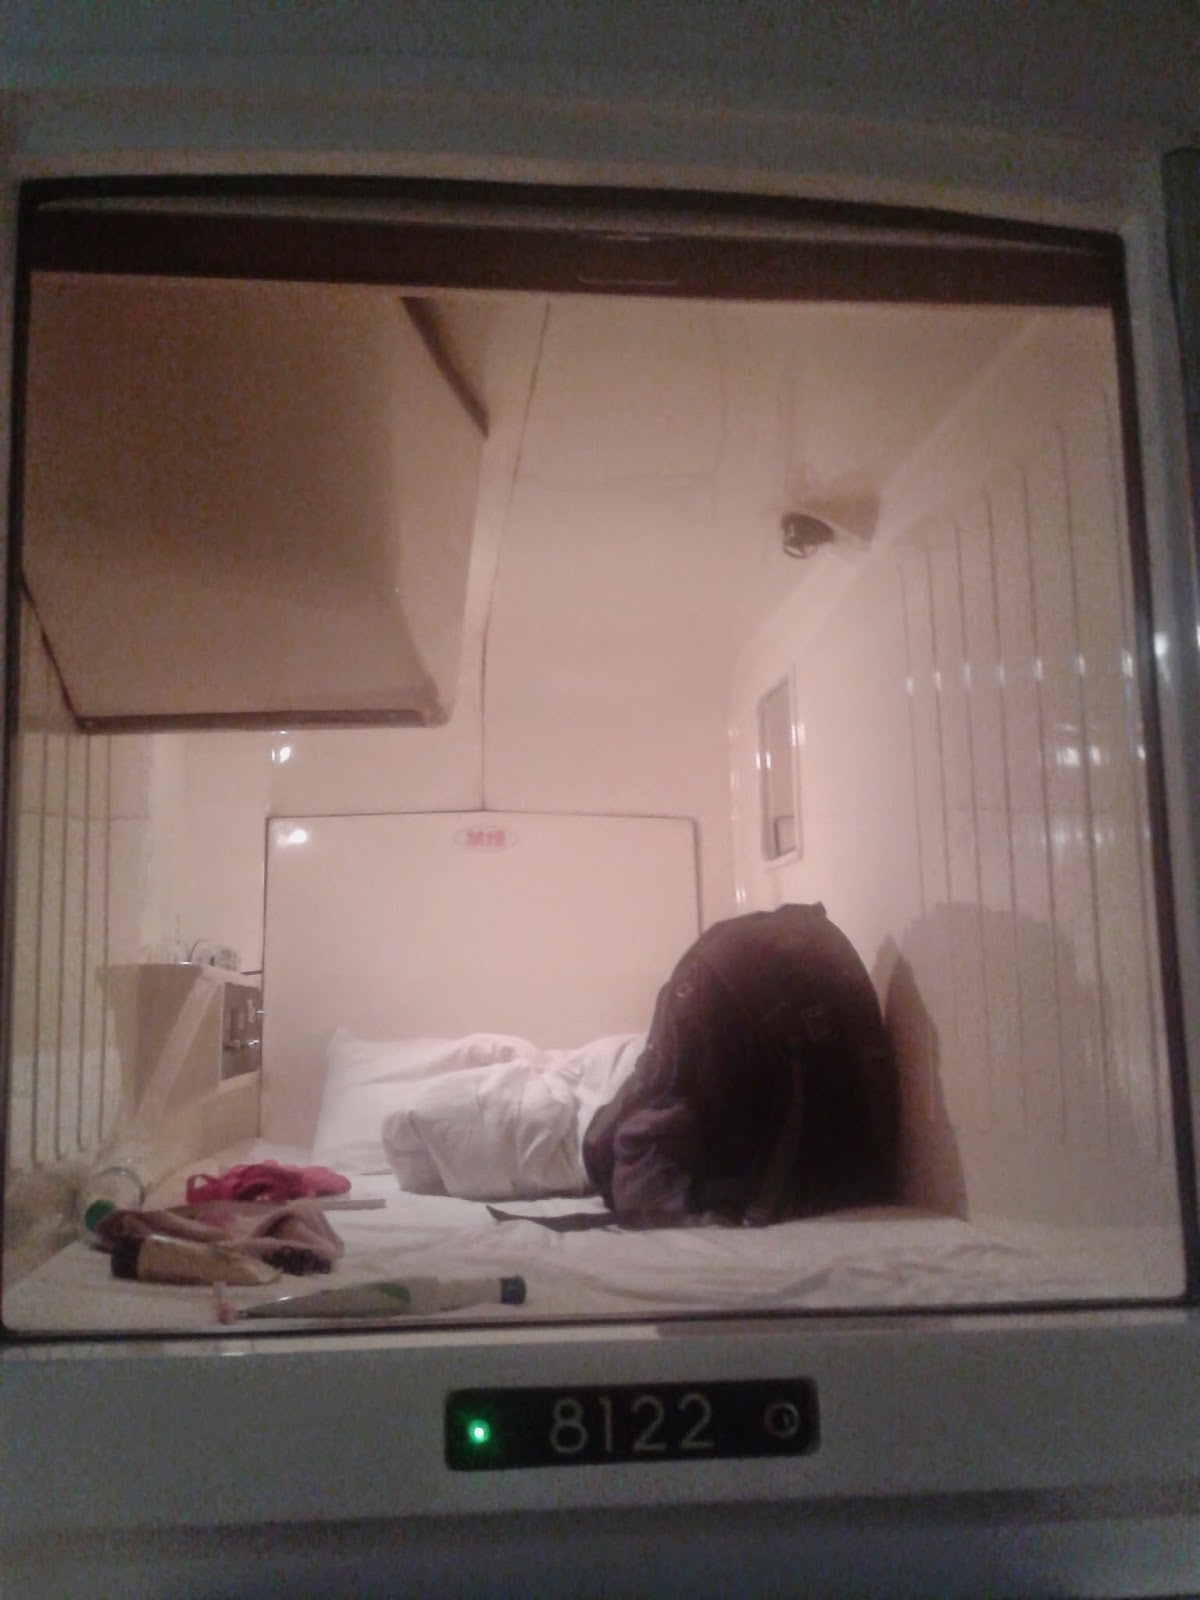 Staying at Shinjuku Capsule Hotel, Japan | Ummi Goes Where?